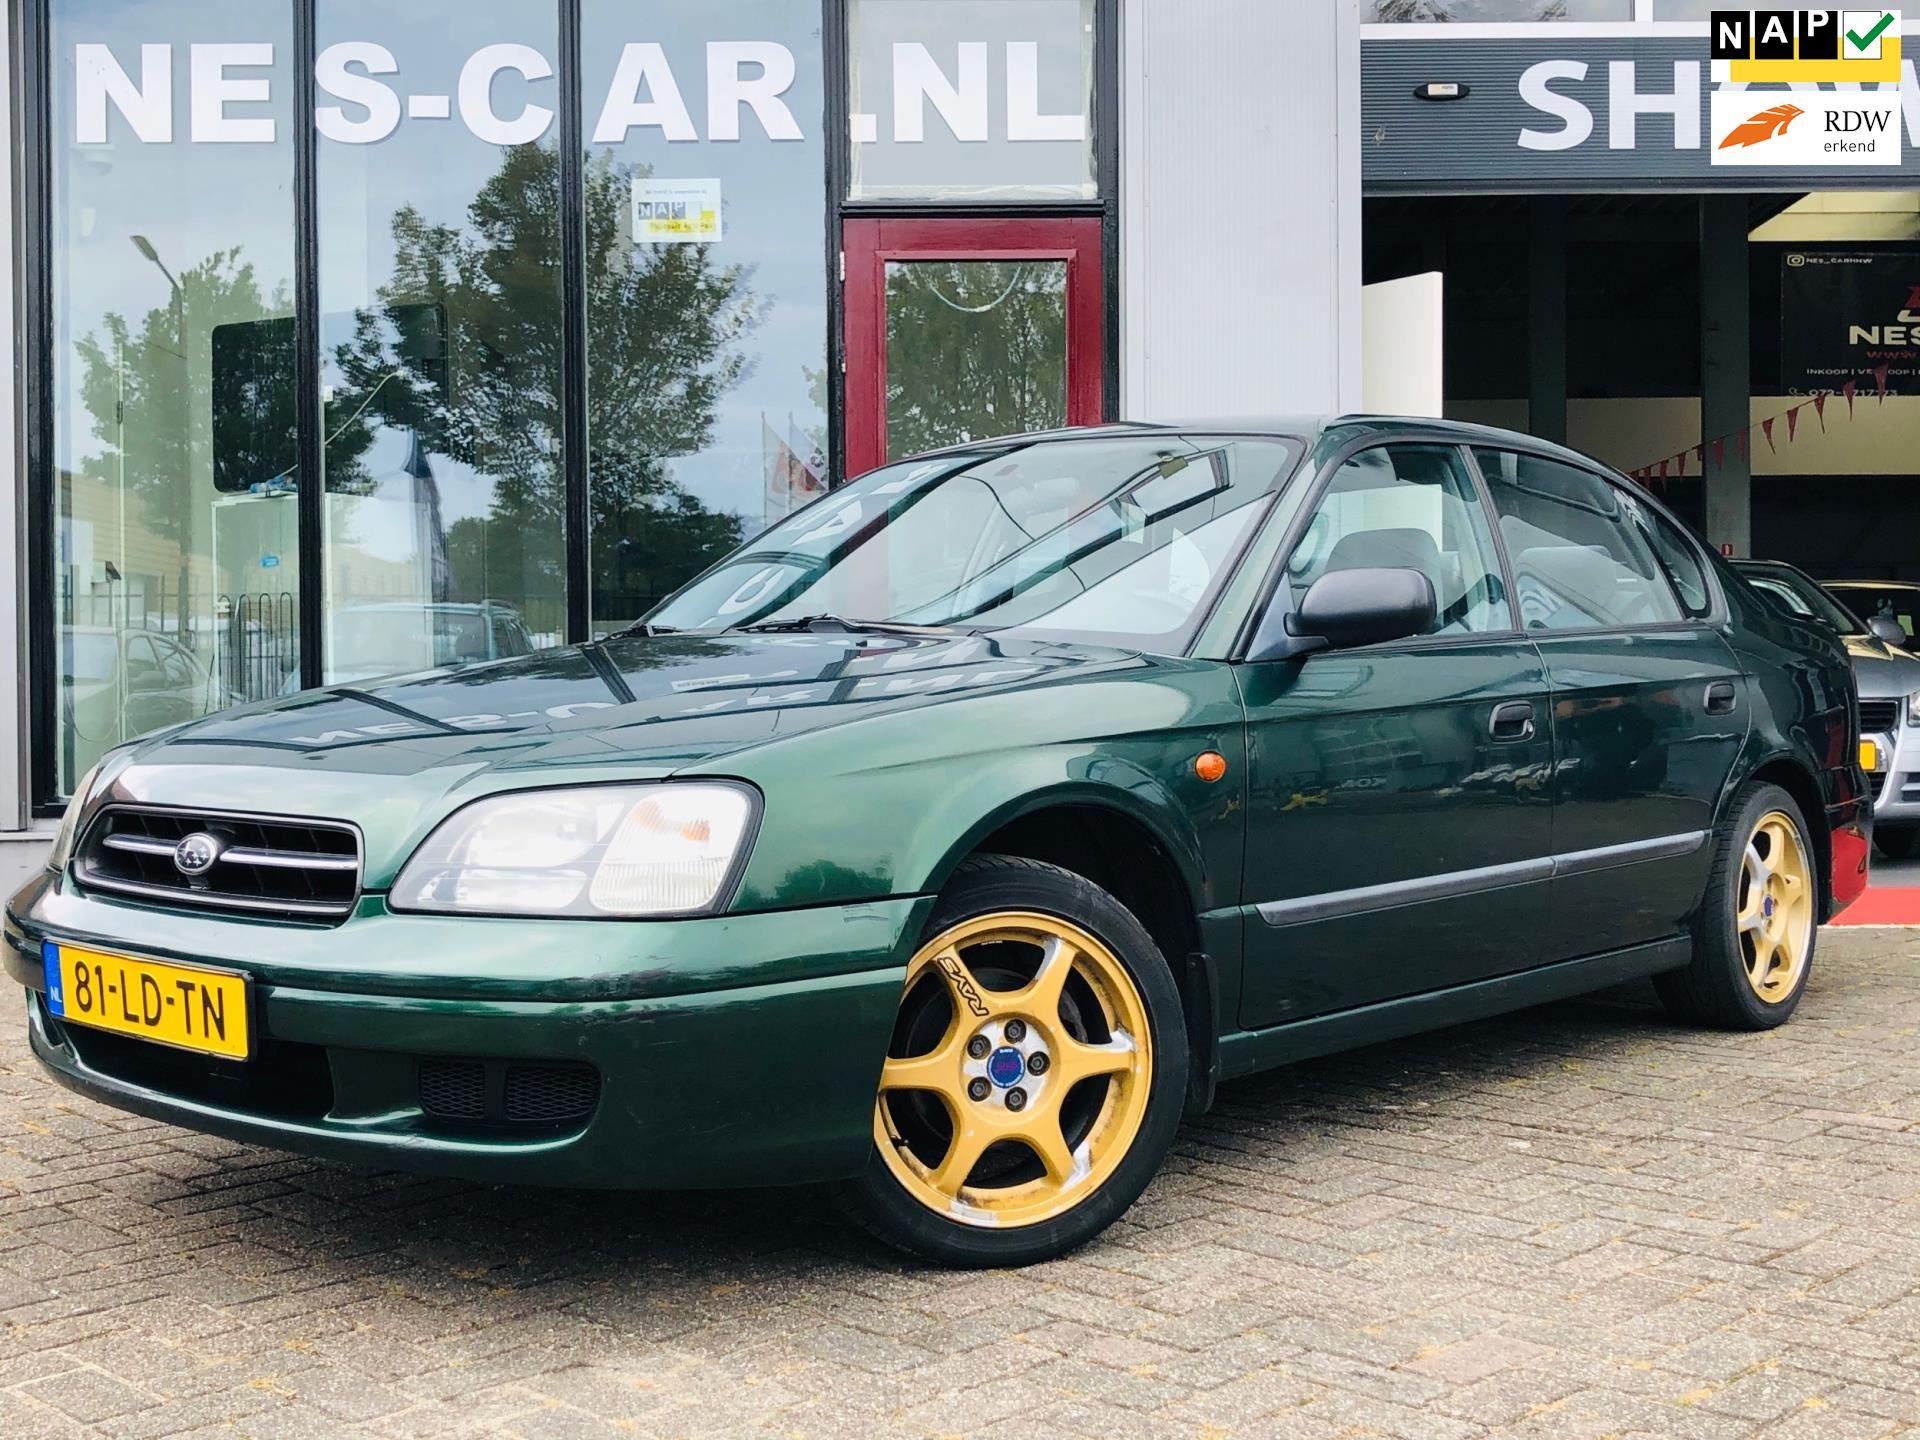 Subaru Legacy occasion - Nescar